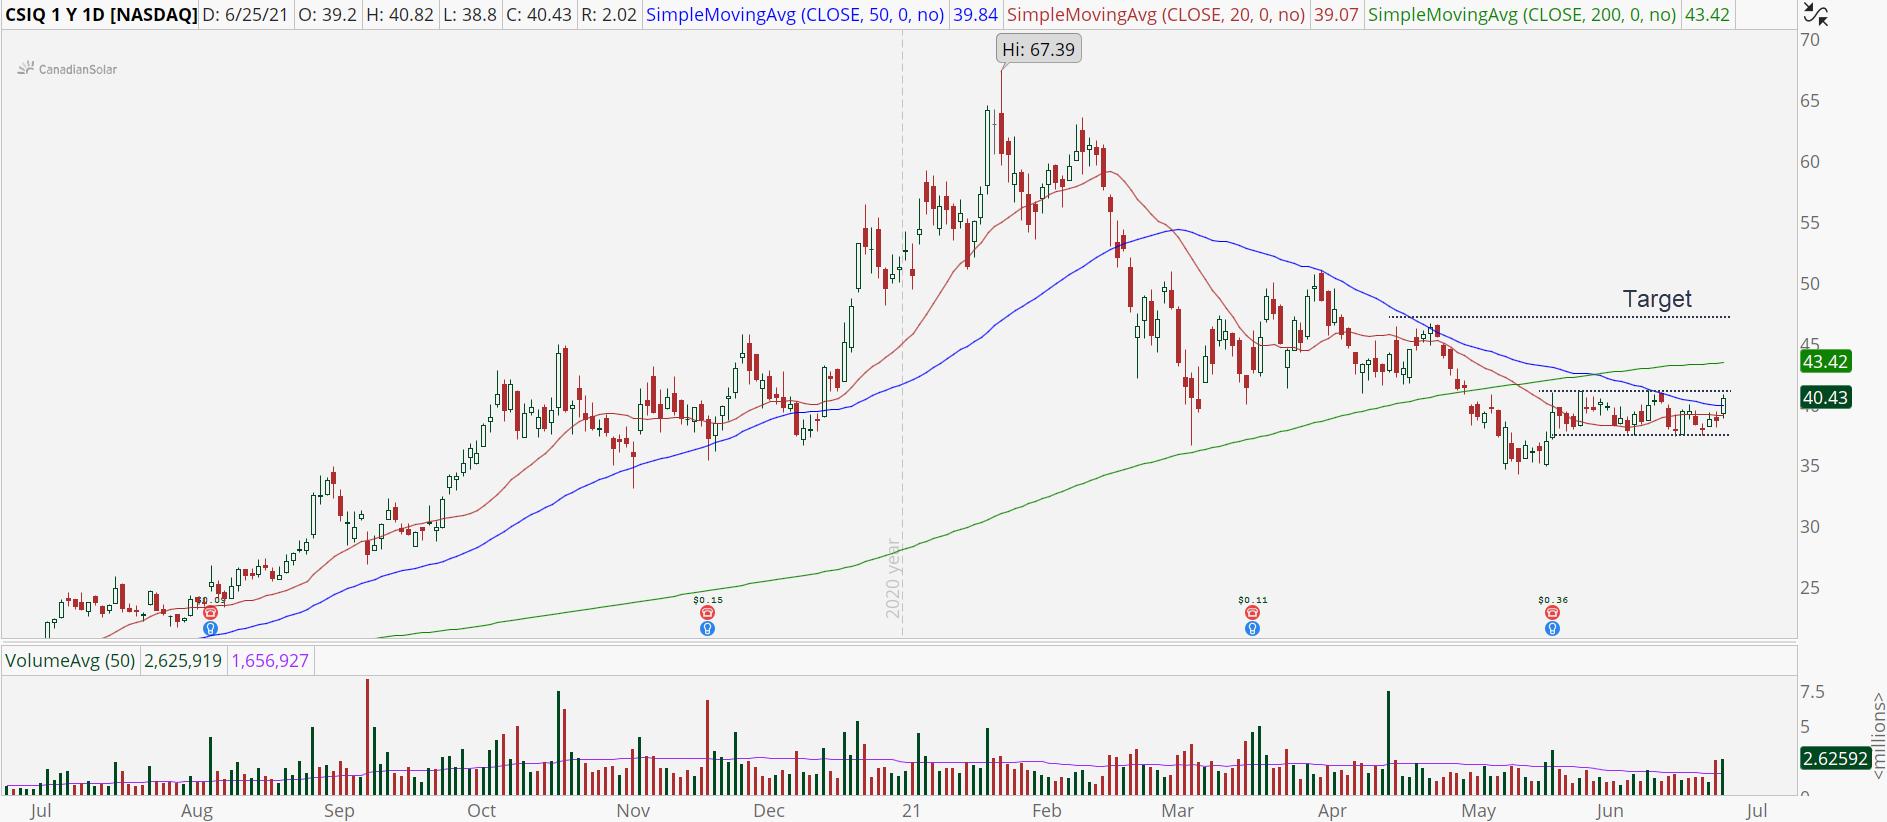 Canadian Solar (CSIQ) stock with bullish breakout pattern.